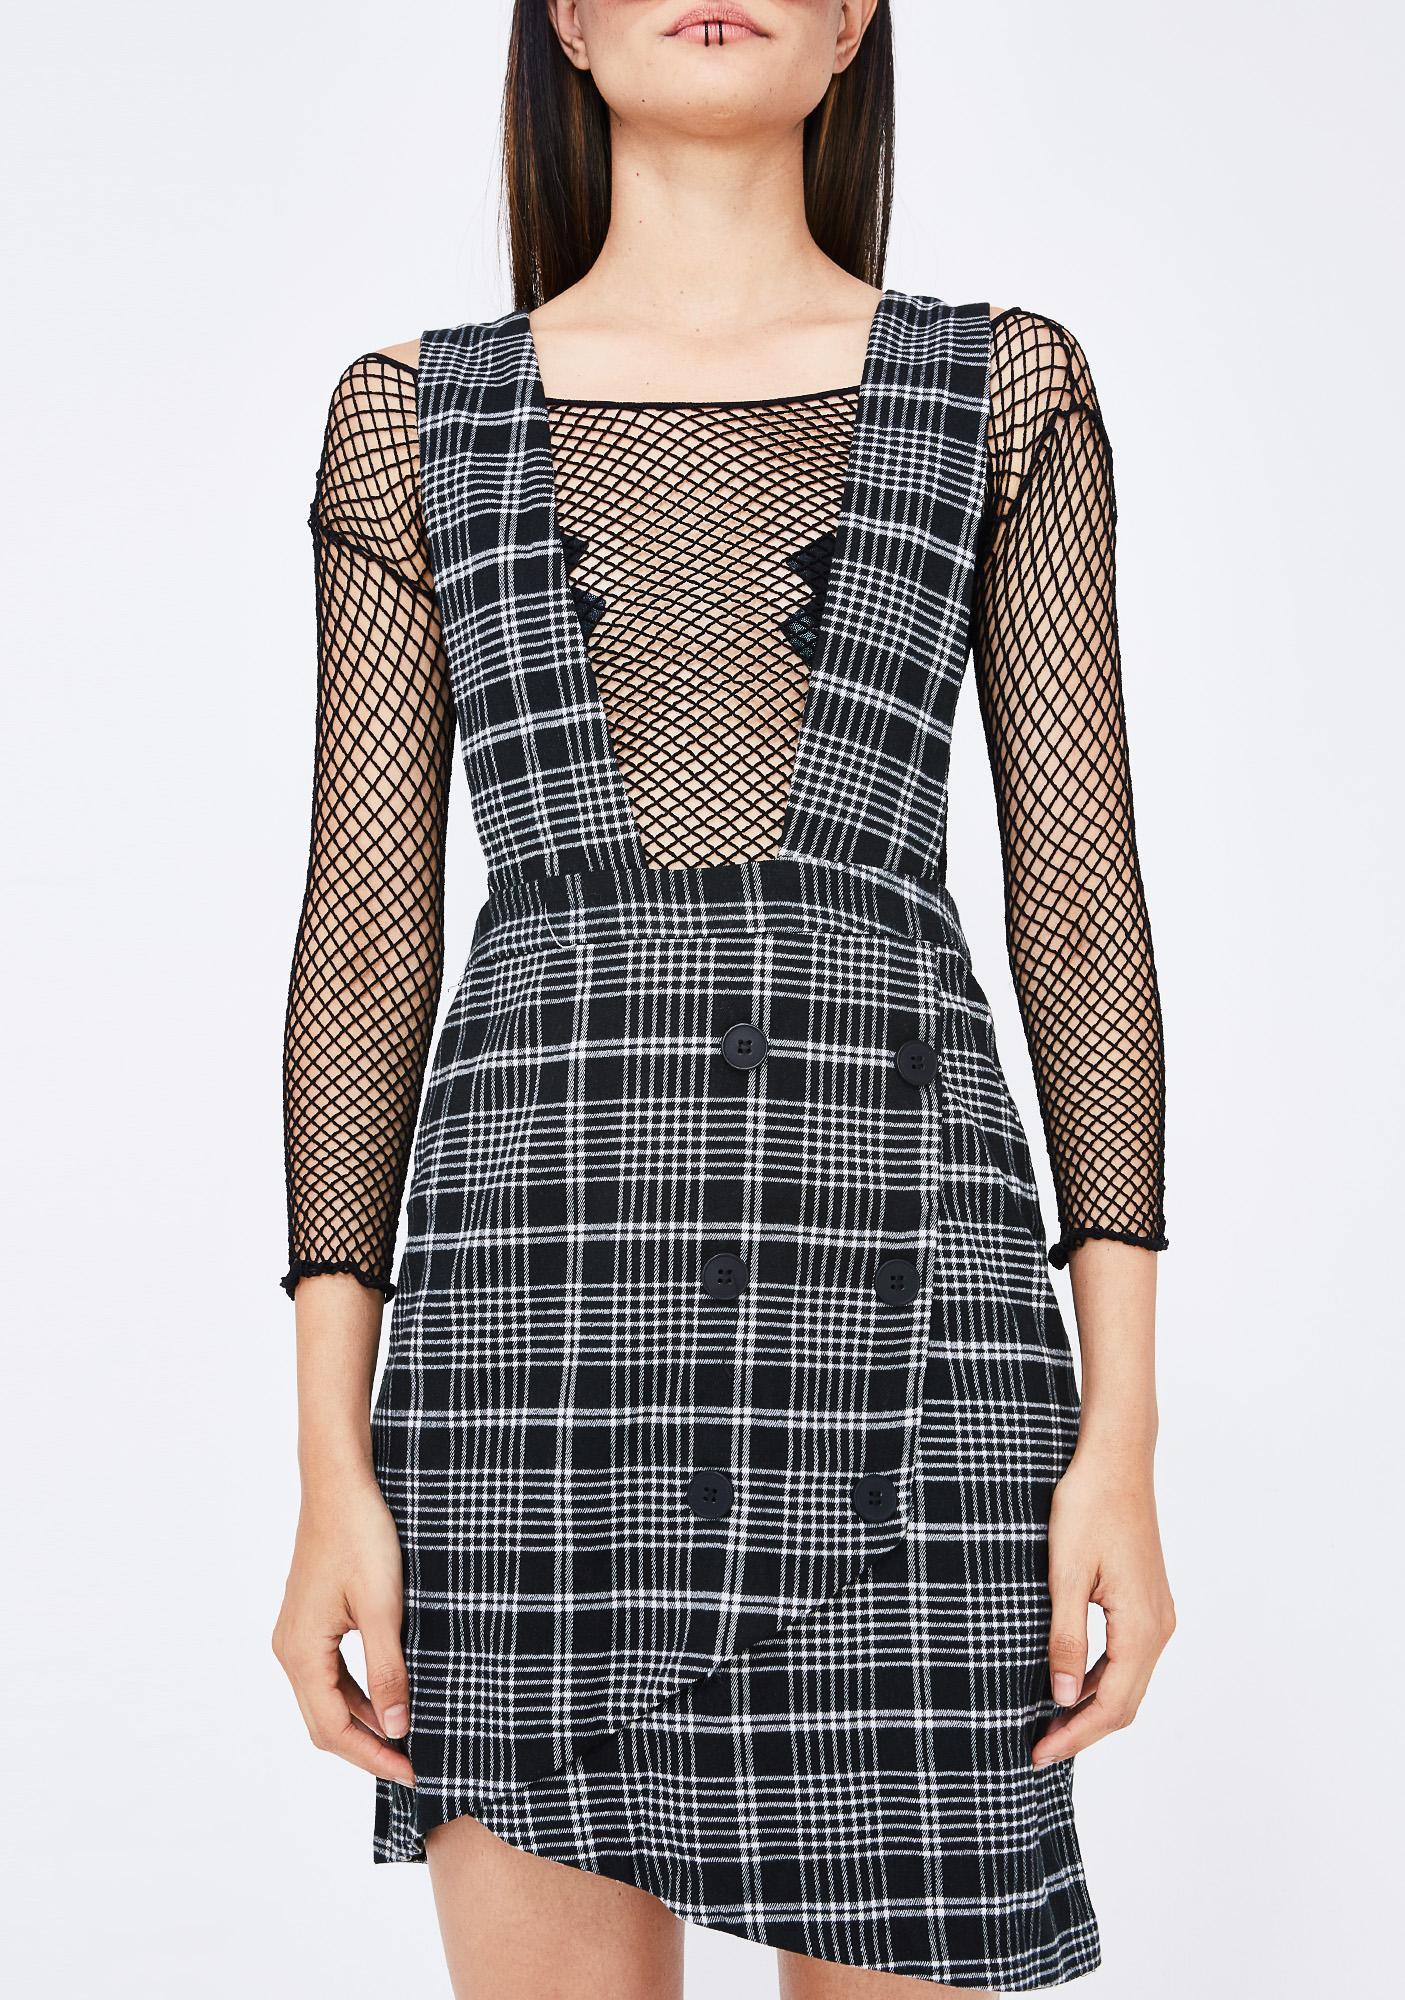 Xtra Credit Plaid Dress